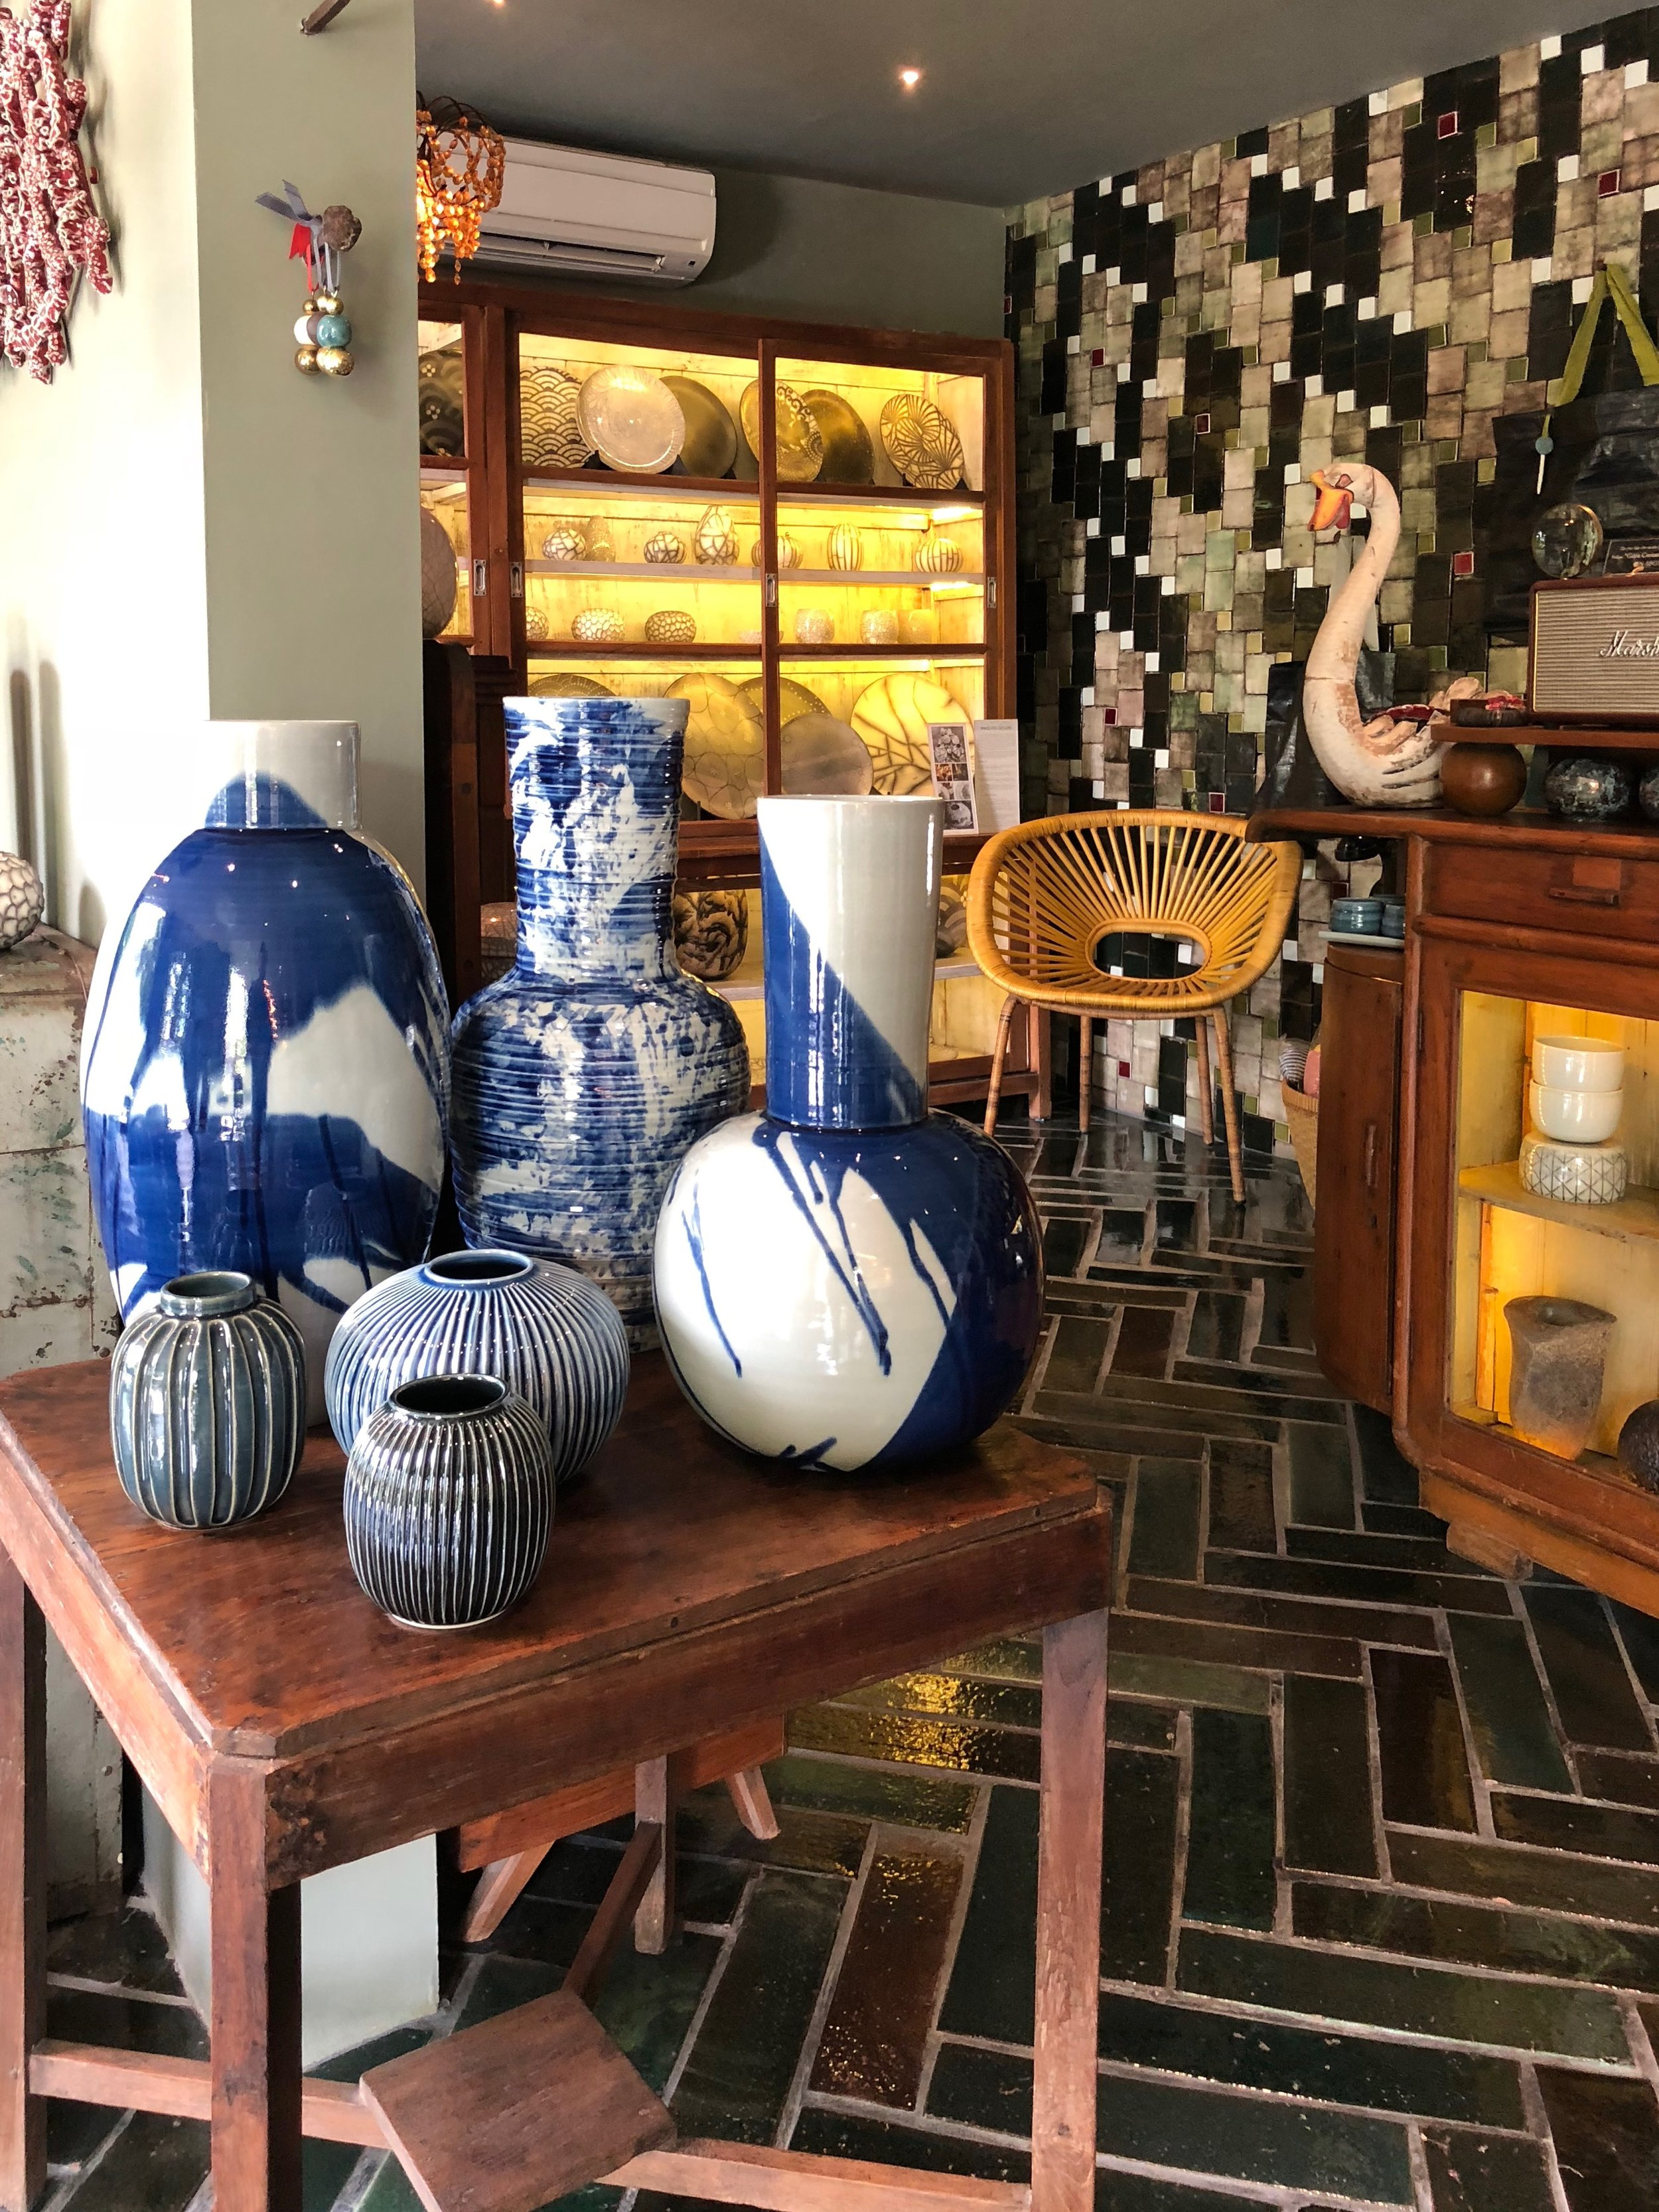 The Gaya Ceramic shop is like walking through an art exhibit